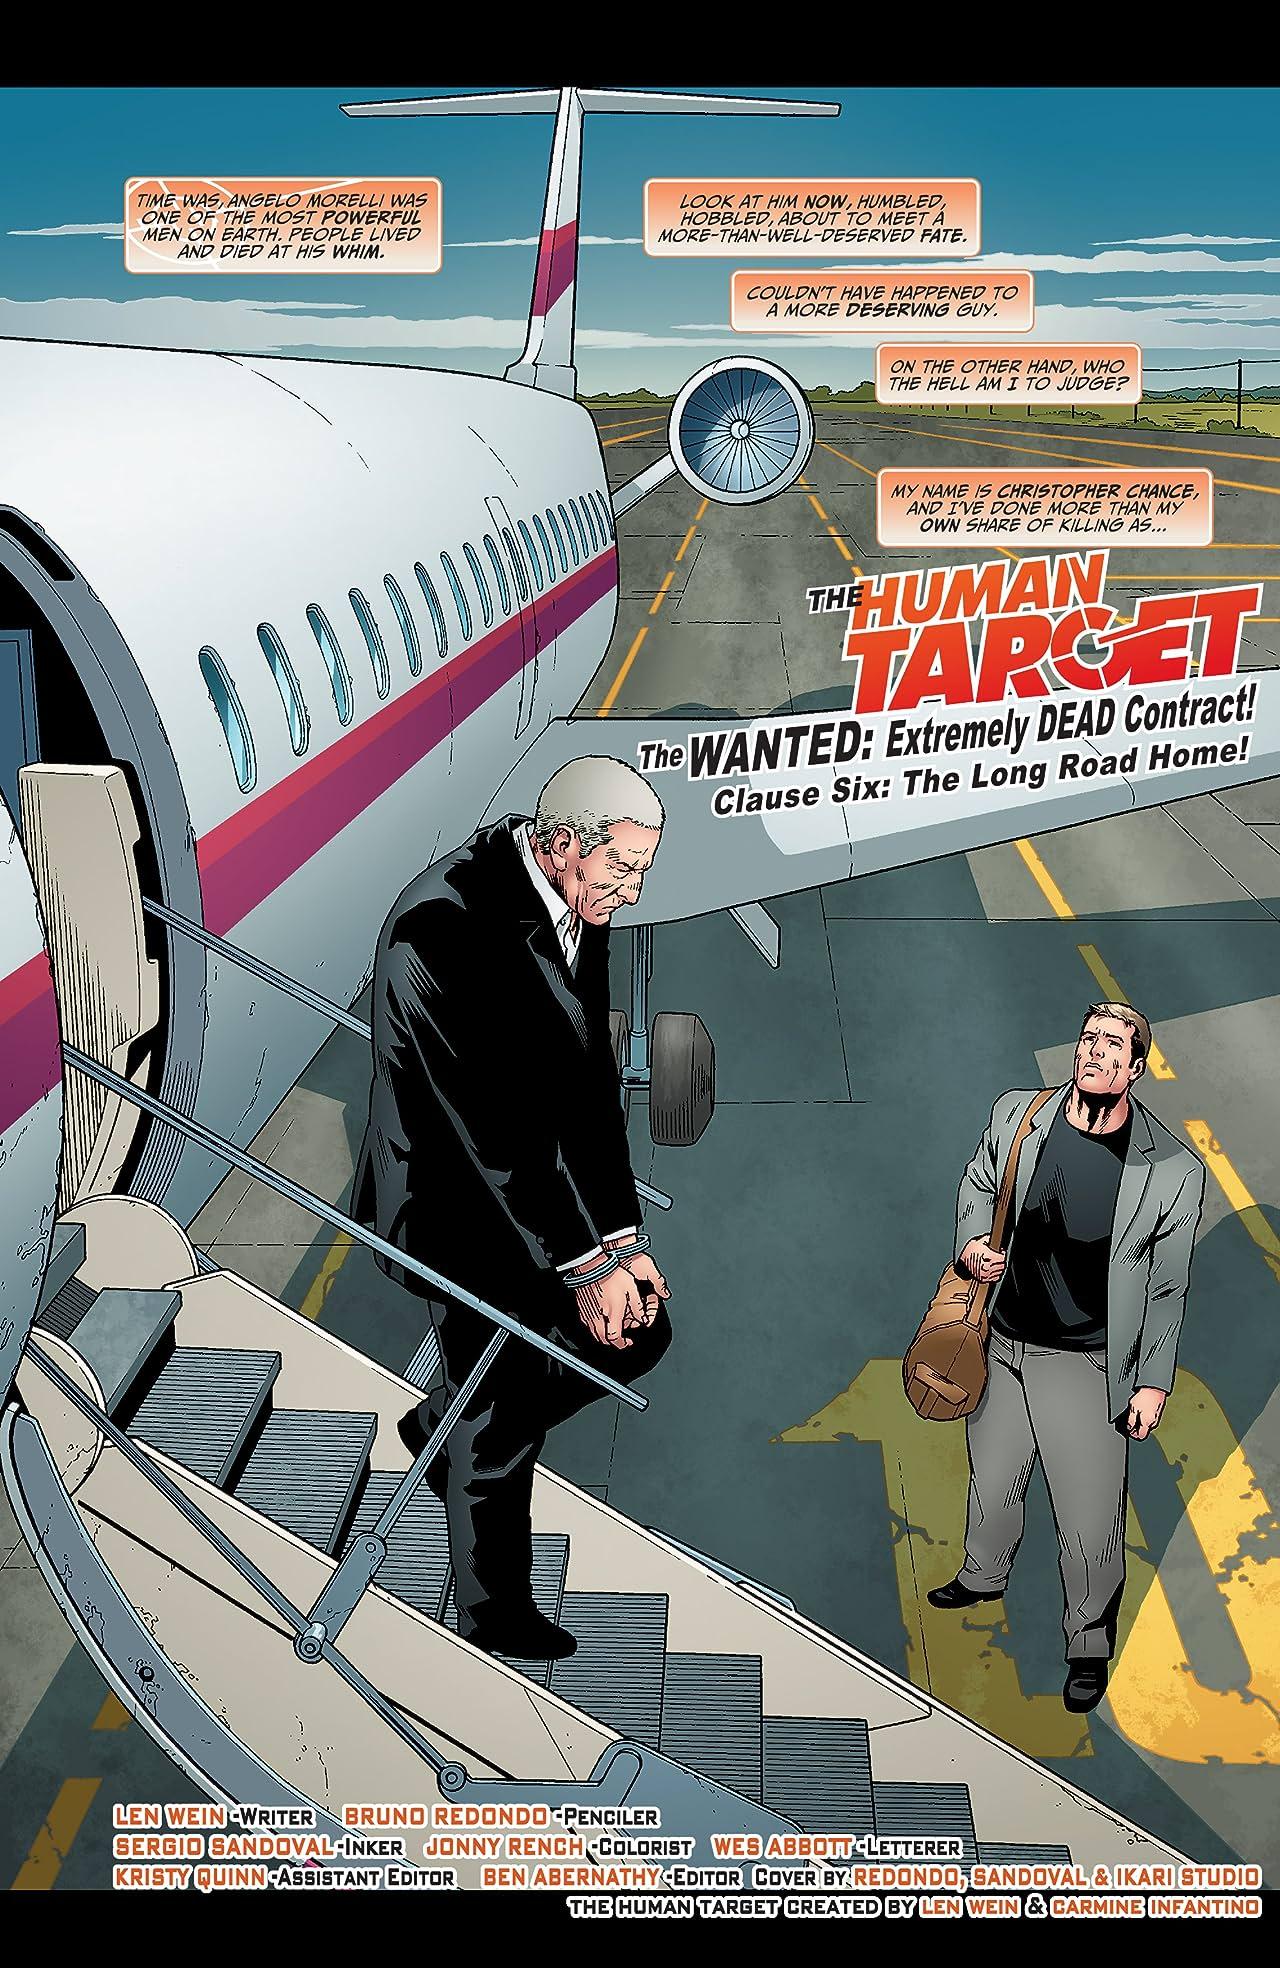 Human Target (2010) #6 (of 6)